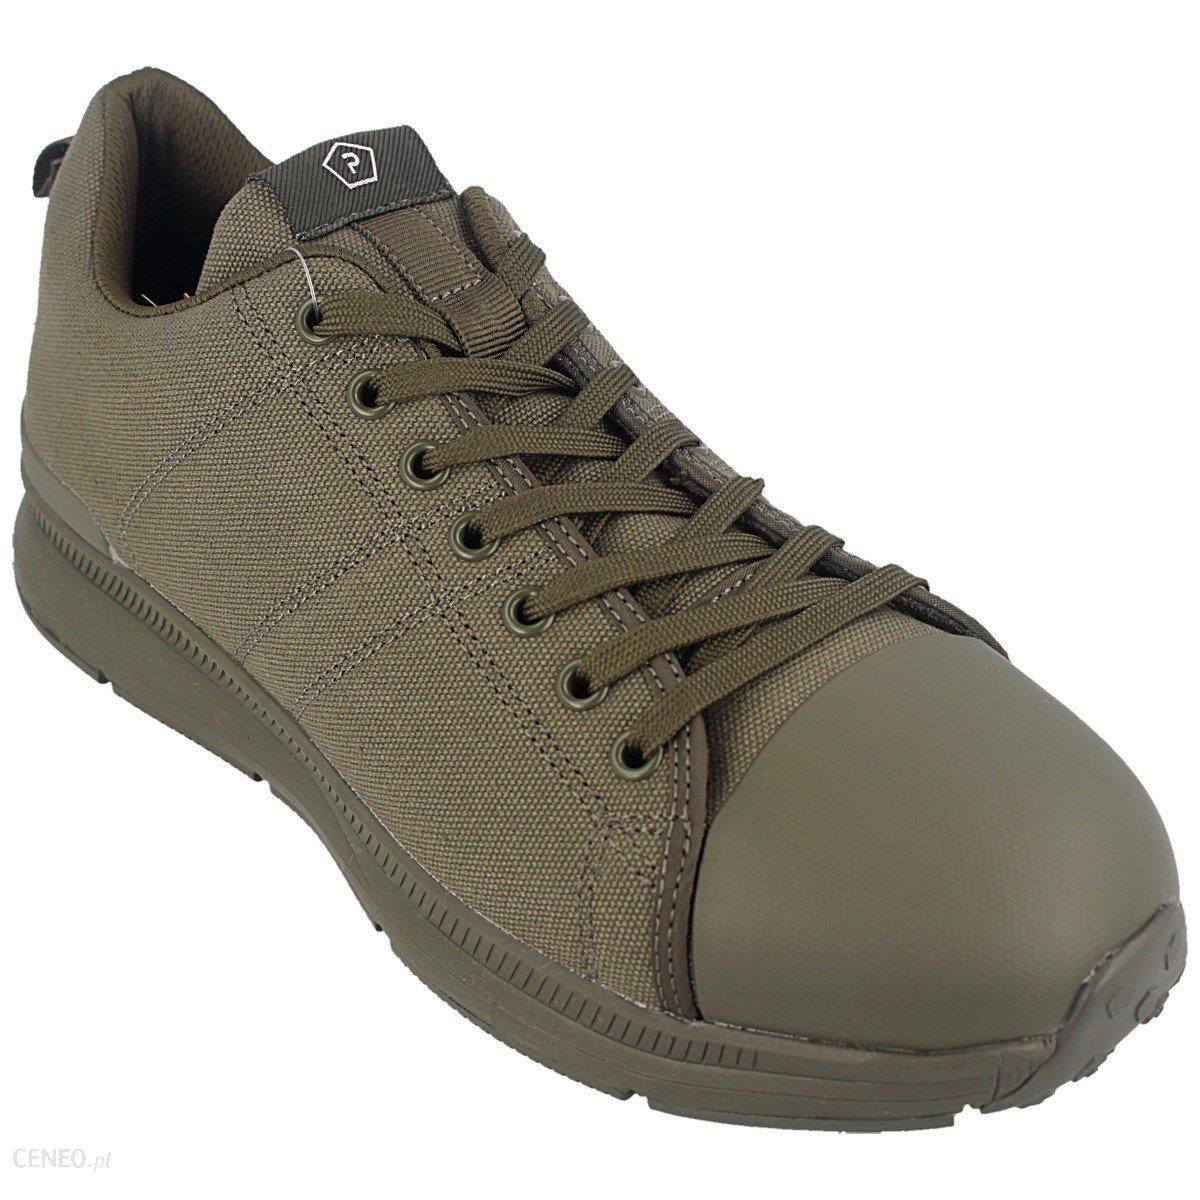 Pentagon Buty Hybrid Shoes Camo Green (K15037-06Cg)